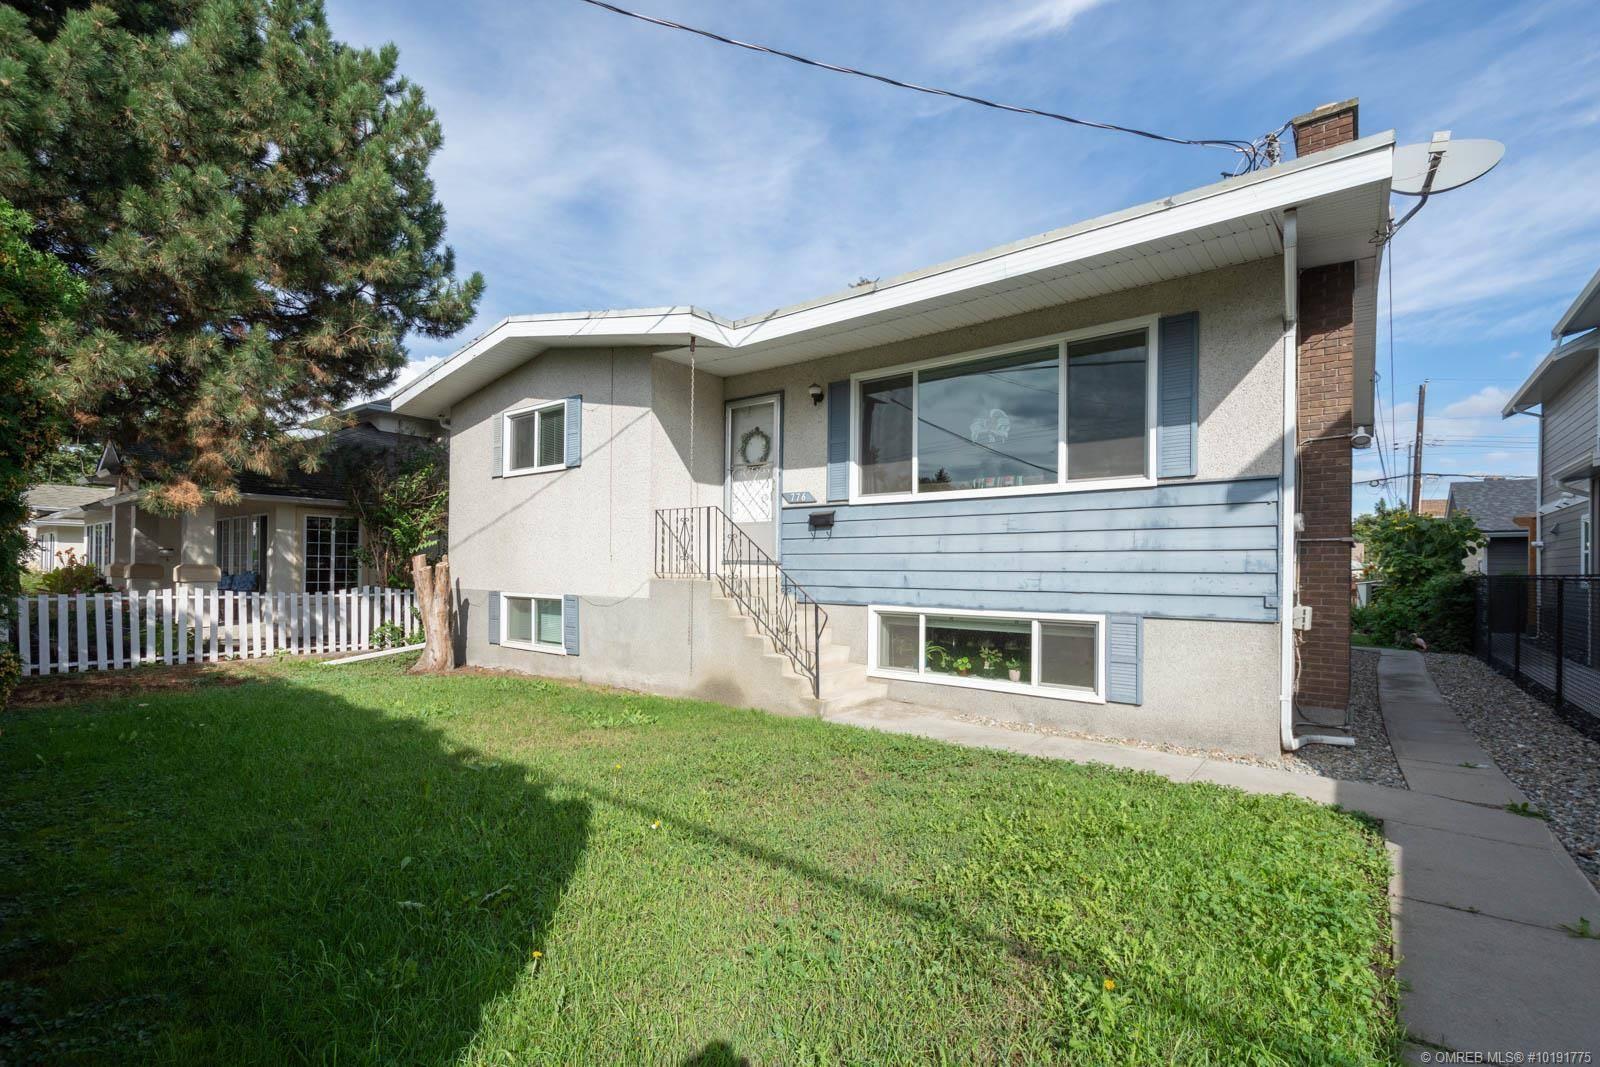 House for sale at 776 Glenwood Ave Kelowna British Columbia - MLS: 10191775